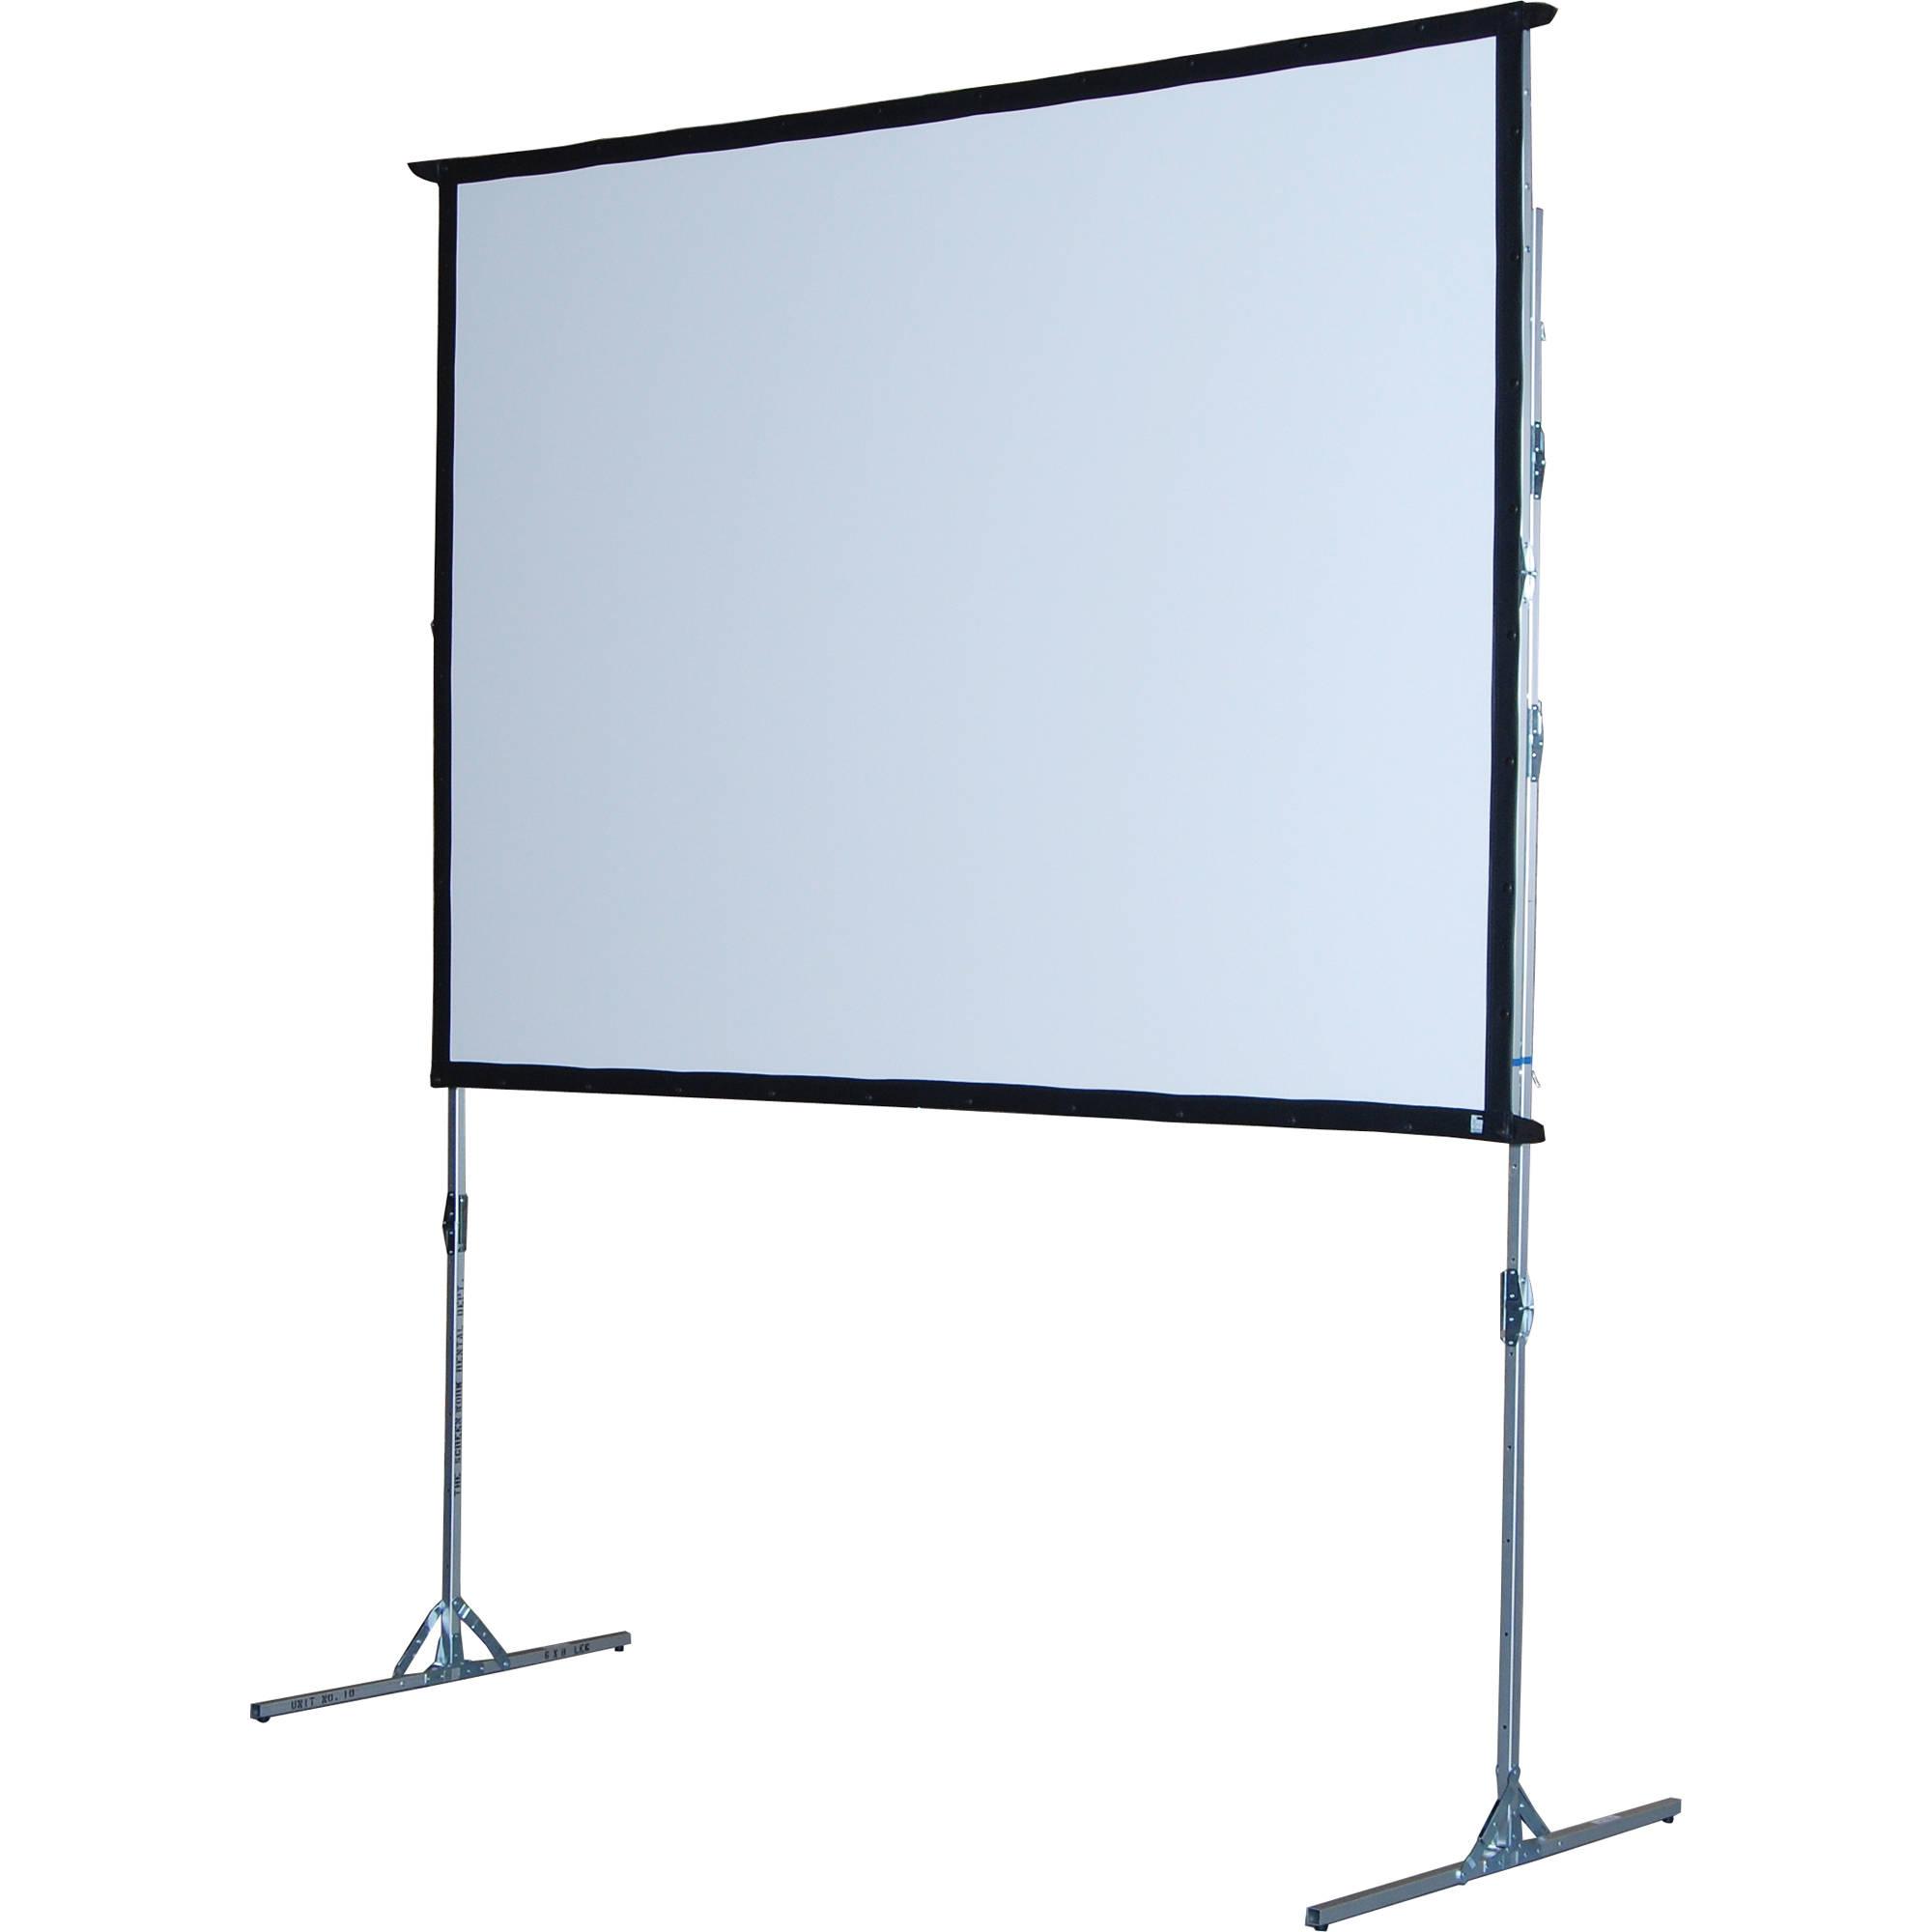 Aliexpress.com : Buy Full HD 150inch 4 To 3 Ratio Rear ...  Rear Projection Screen